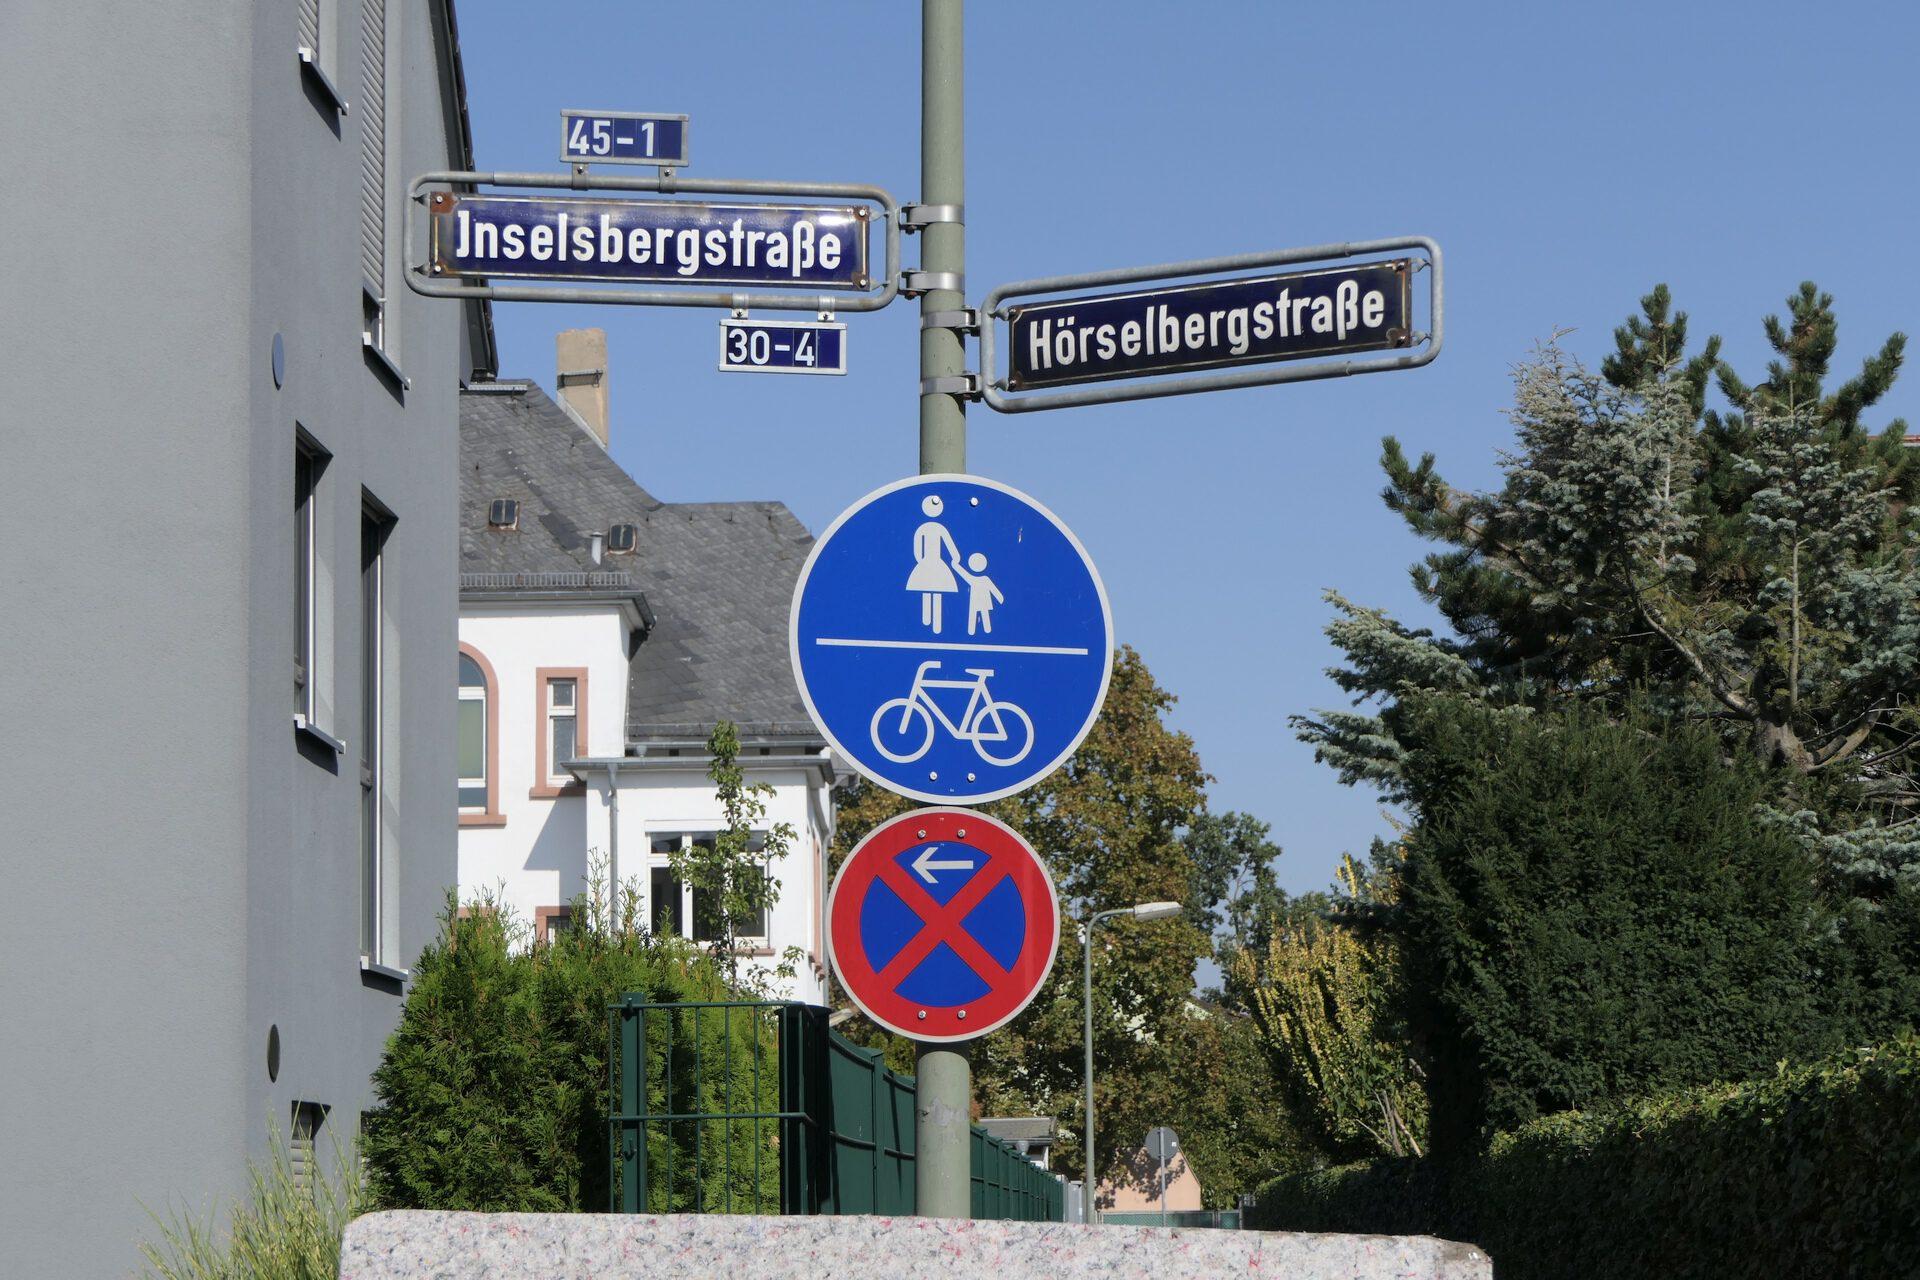 Frankfurt am Main Unterliederbach. Hörselbergstraße / Inselsbergstraße